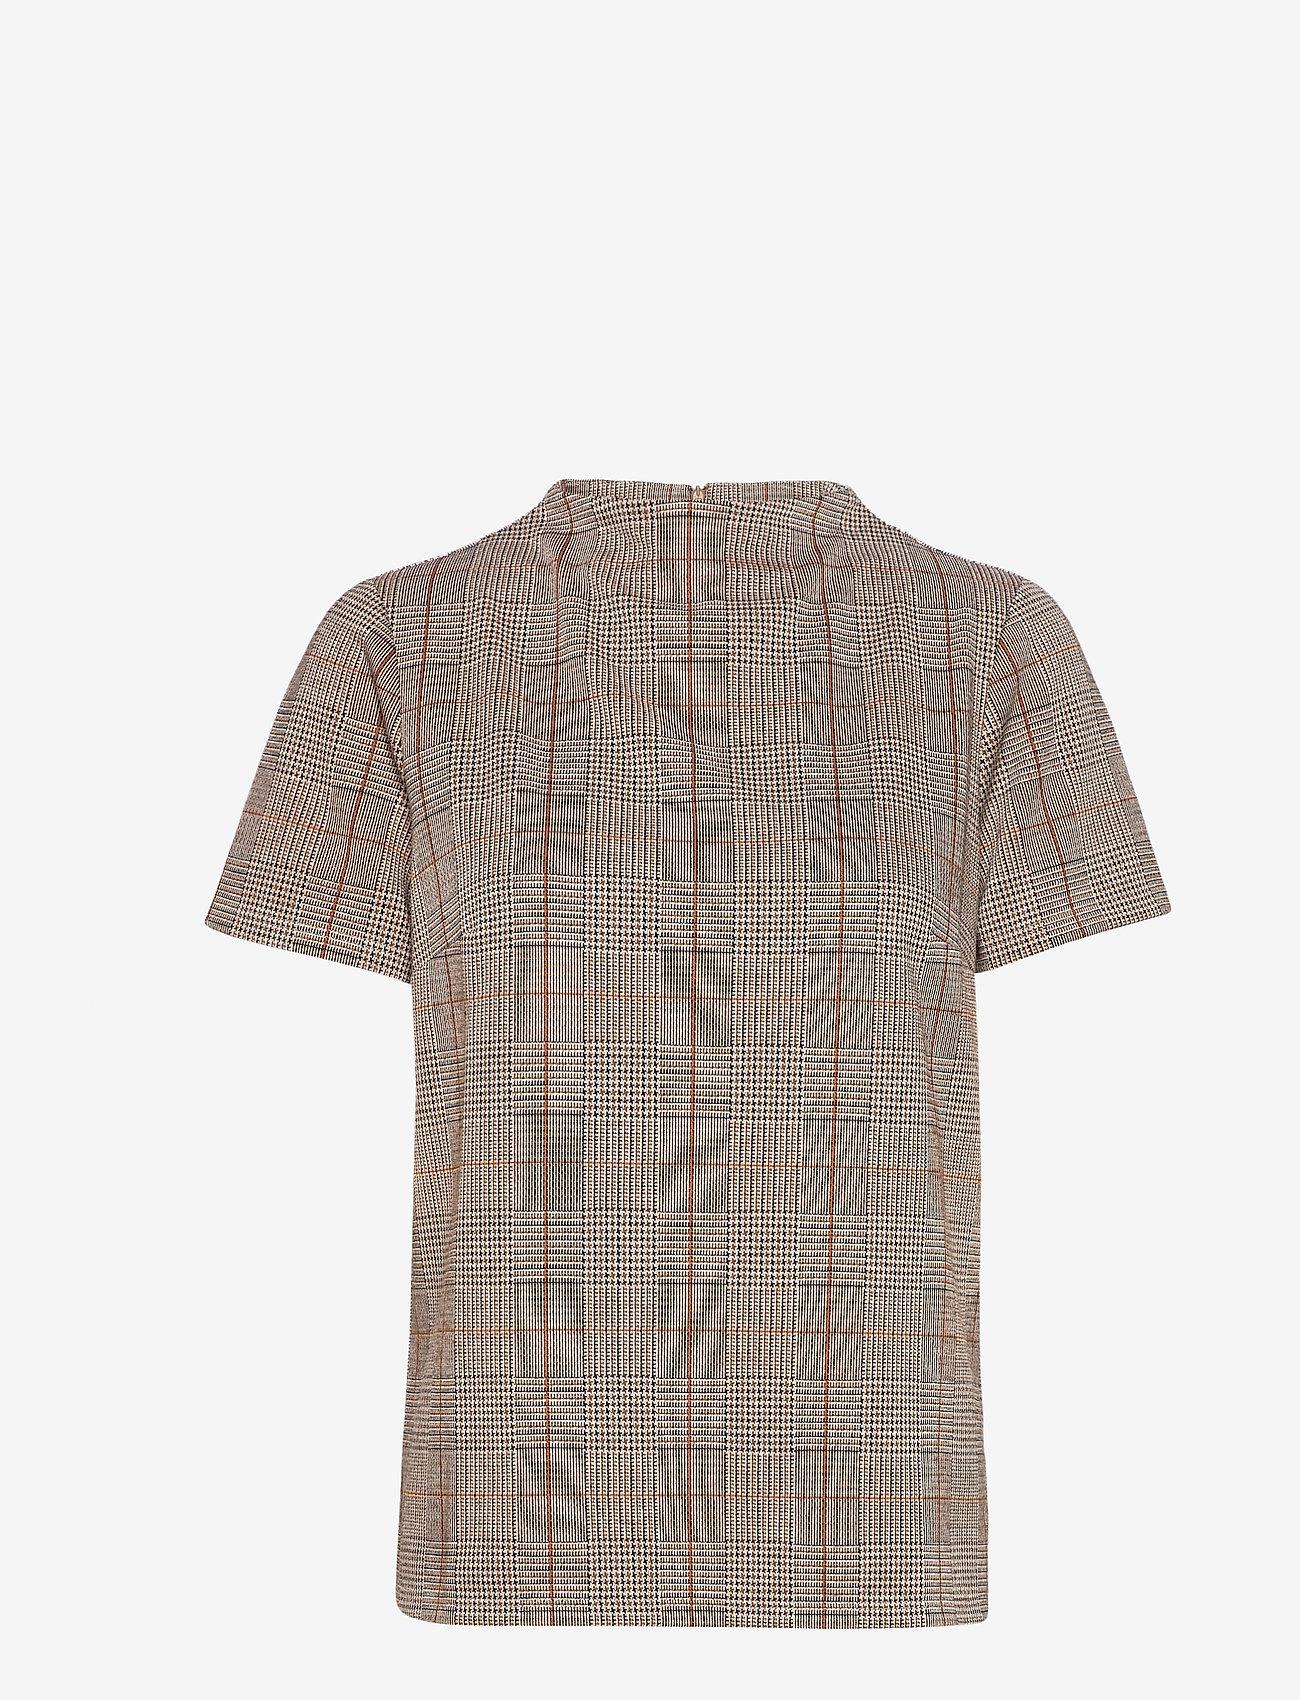 Esprit Collection - T-Shirts - t-shirts - black - 0